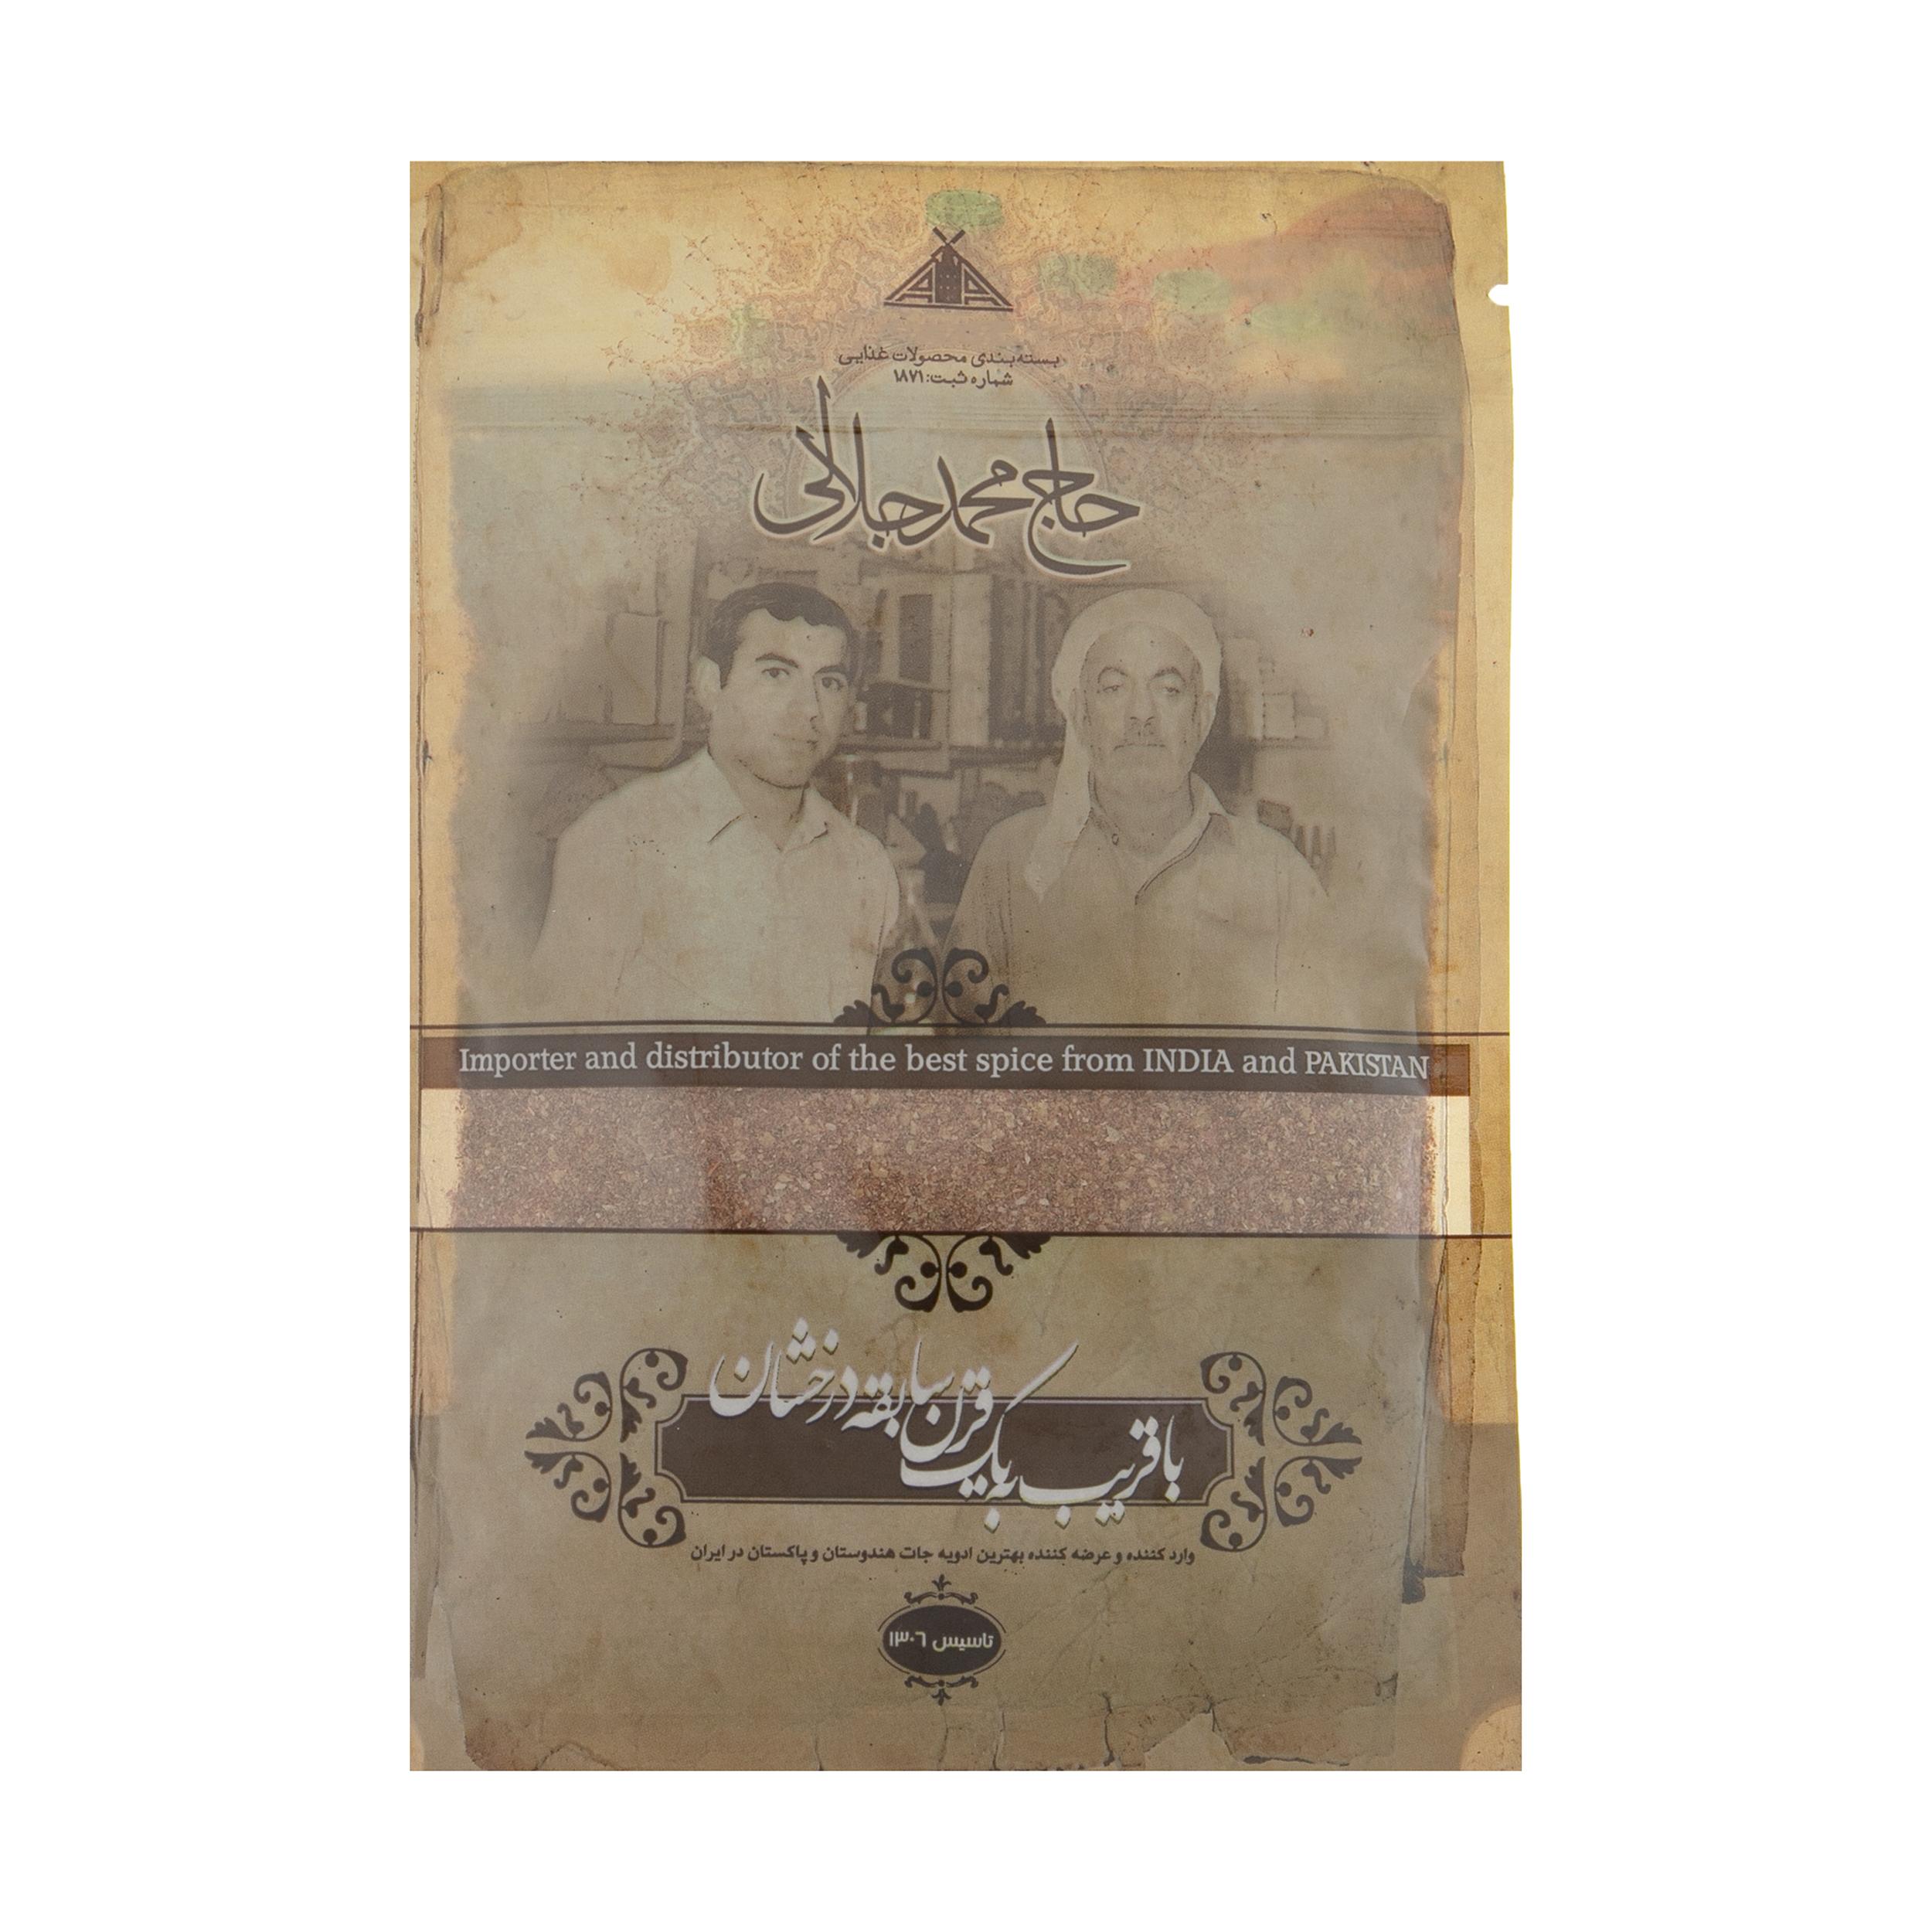 سماق حاج محمد جلالی - 60 گرم